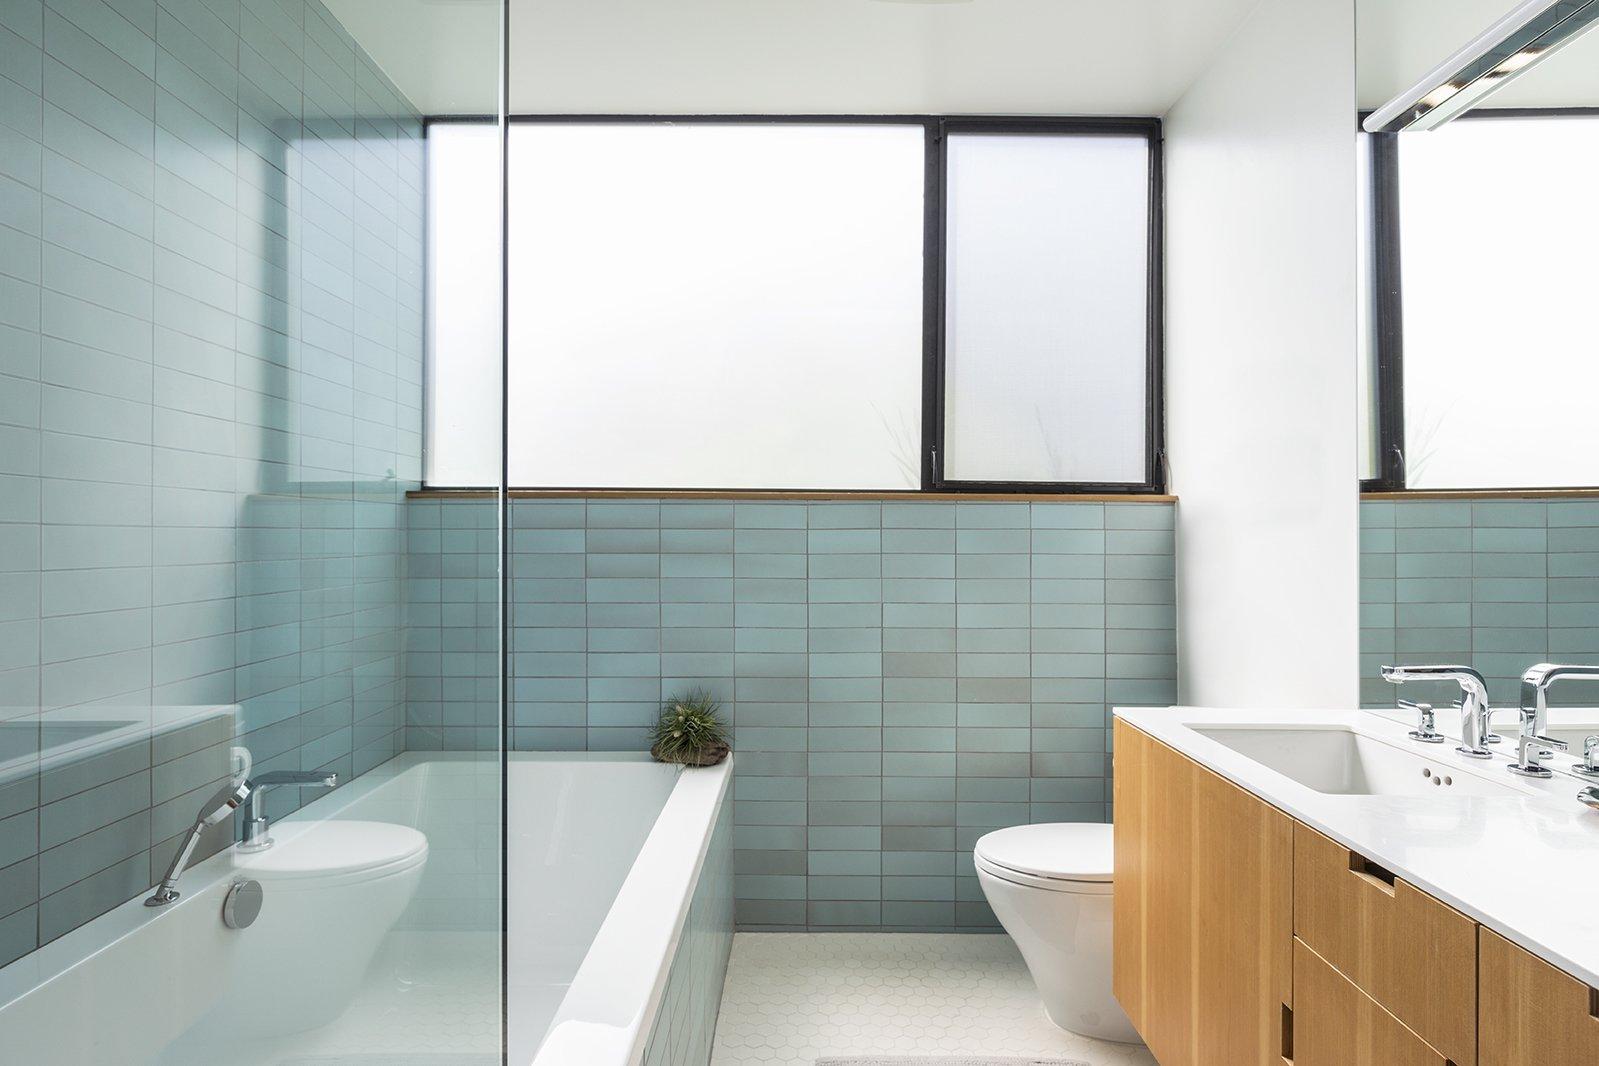 Garden House by Design, Bitches bathroom